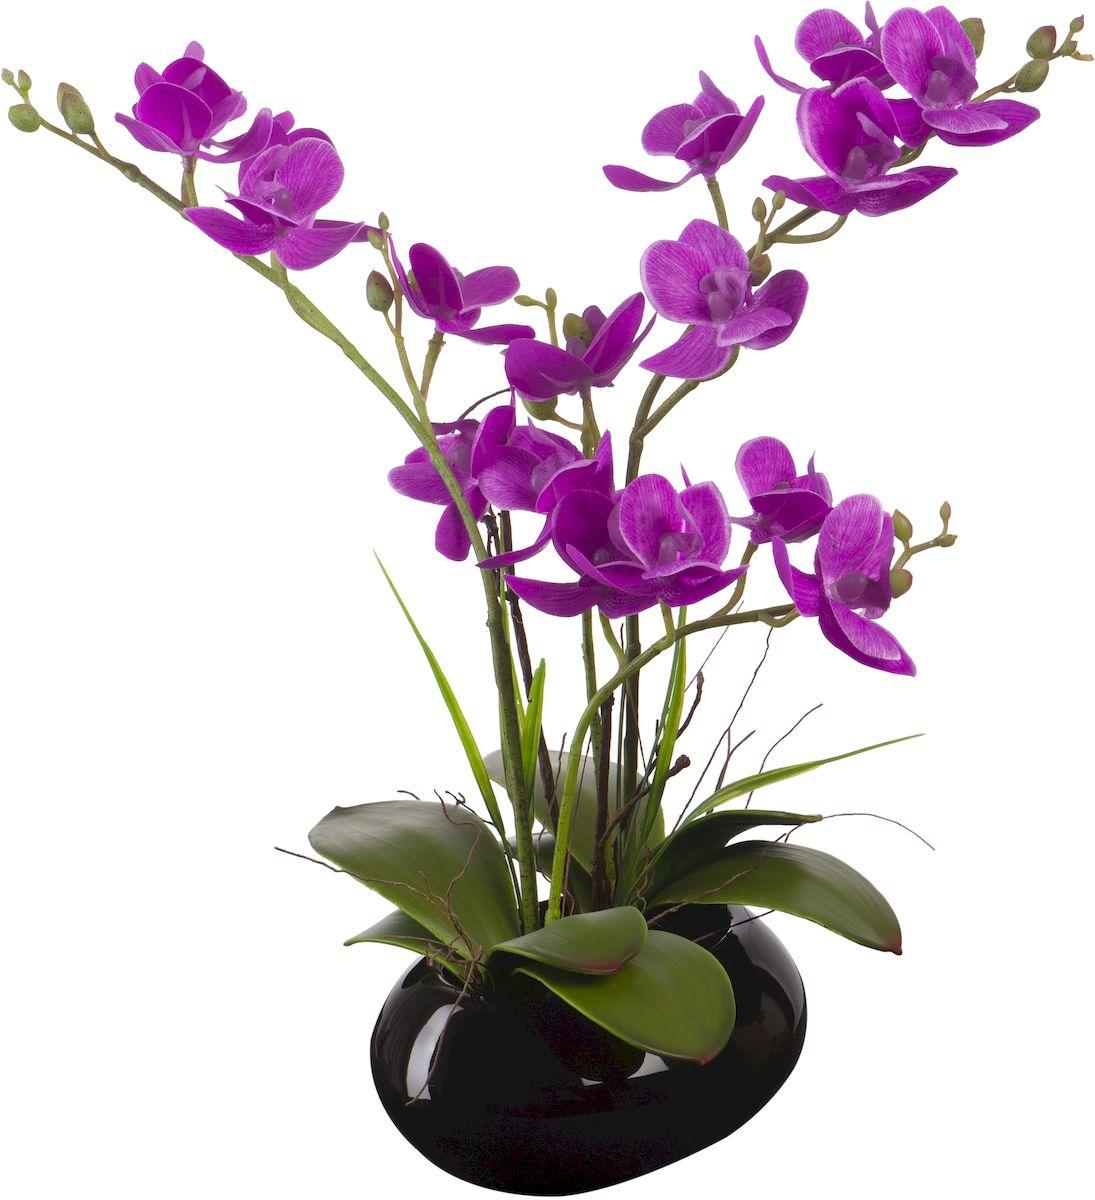 Цветы декоративные Engard Орхидея, в кашпо, 14 х 12 х 34 см кашпо engard цвет желтый 12 5 х 10 х 13 см